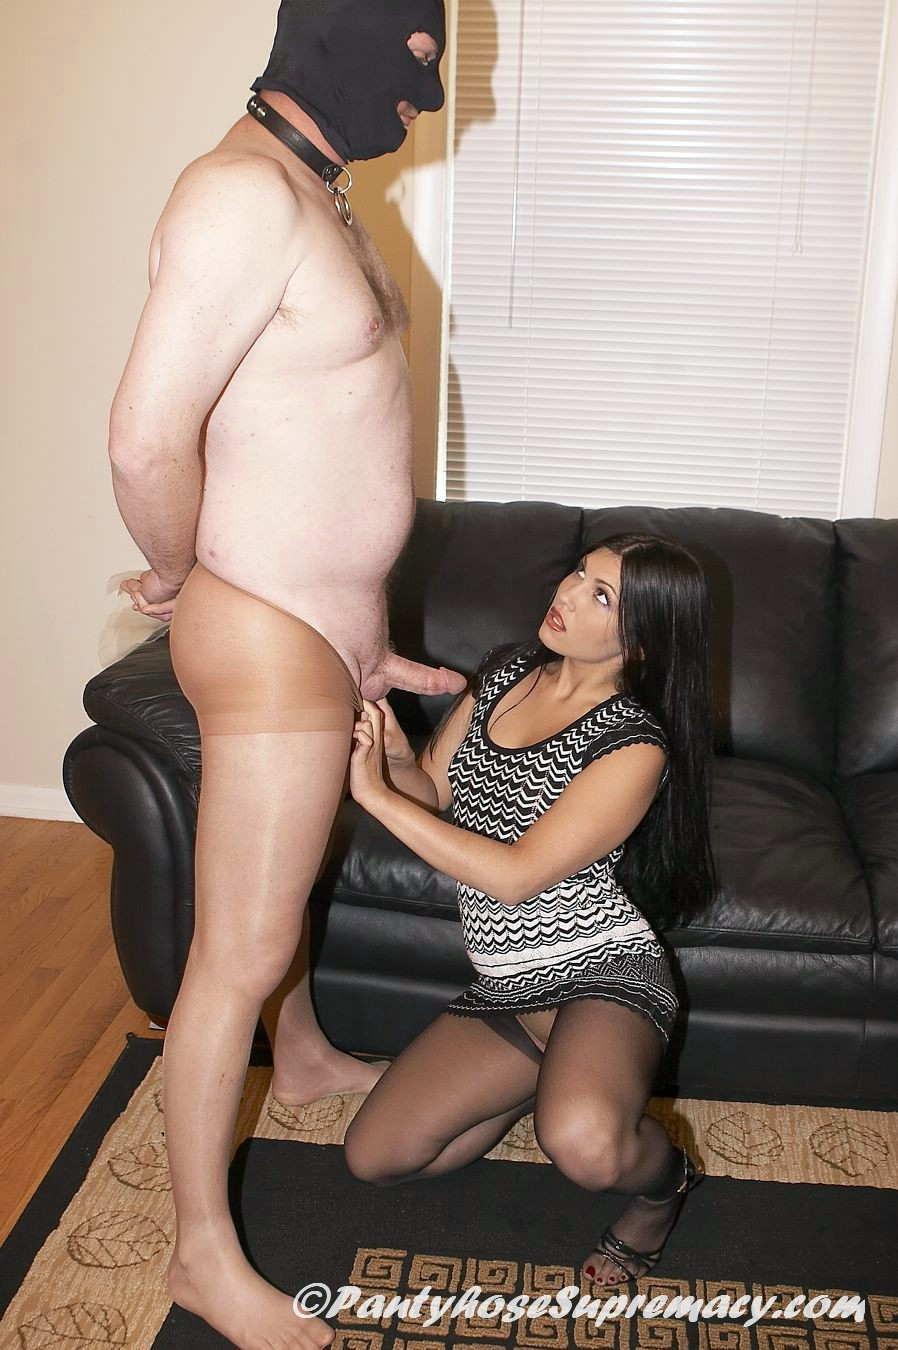 Dominated mistress